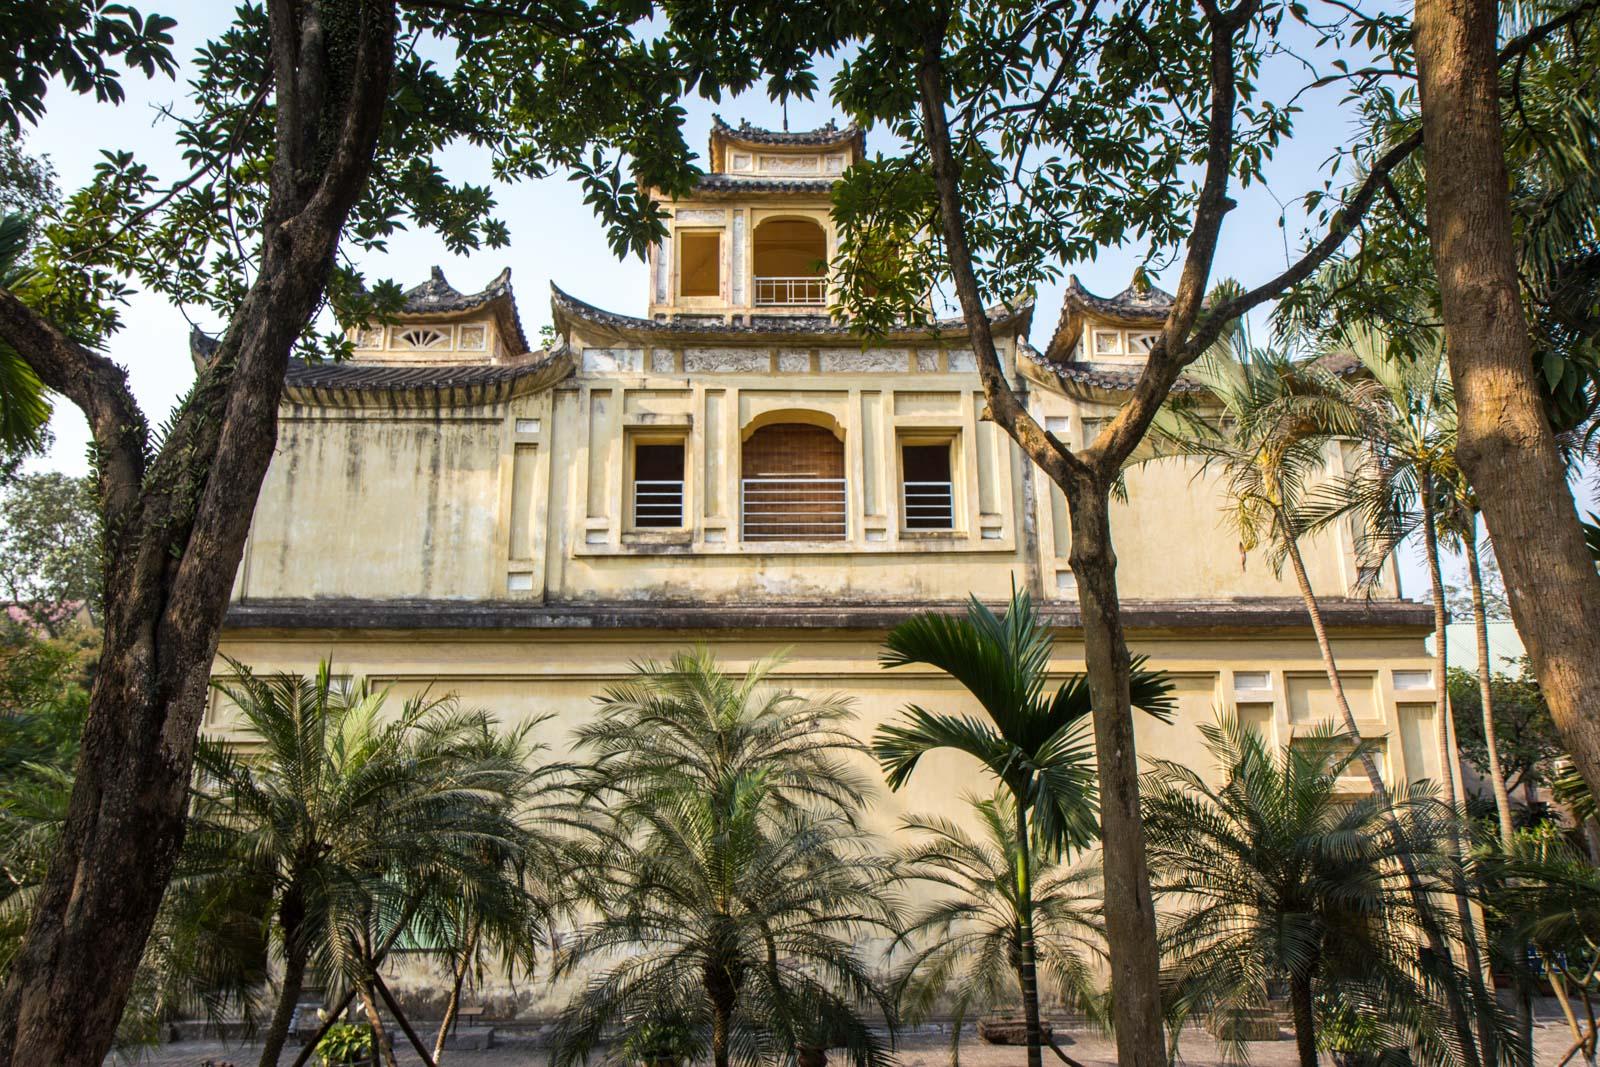 Imperial Citadel of Thang Long, Hanoi, Vietnam